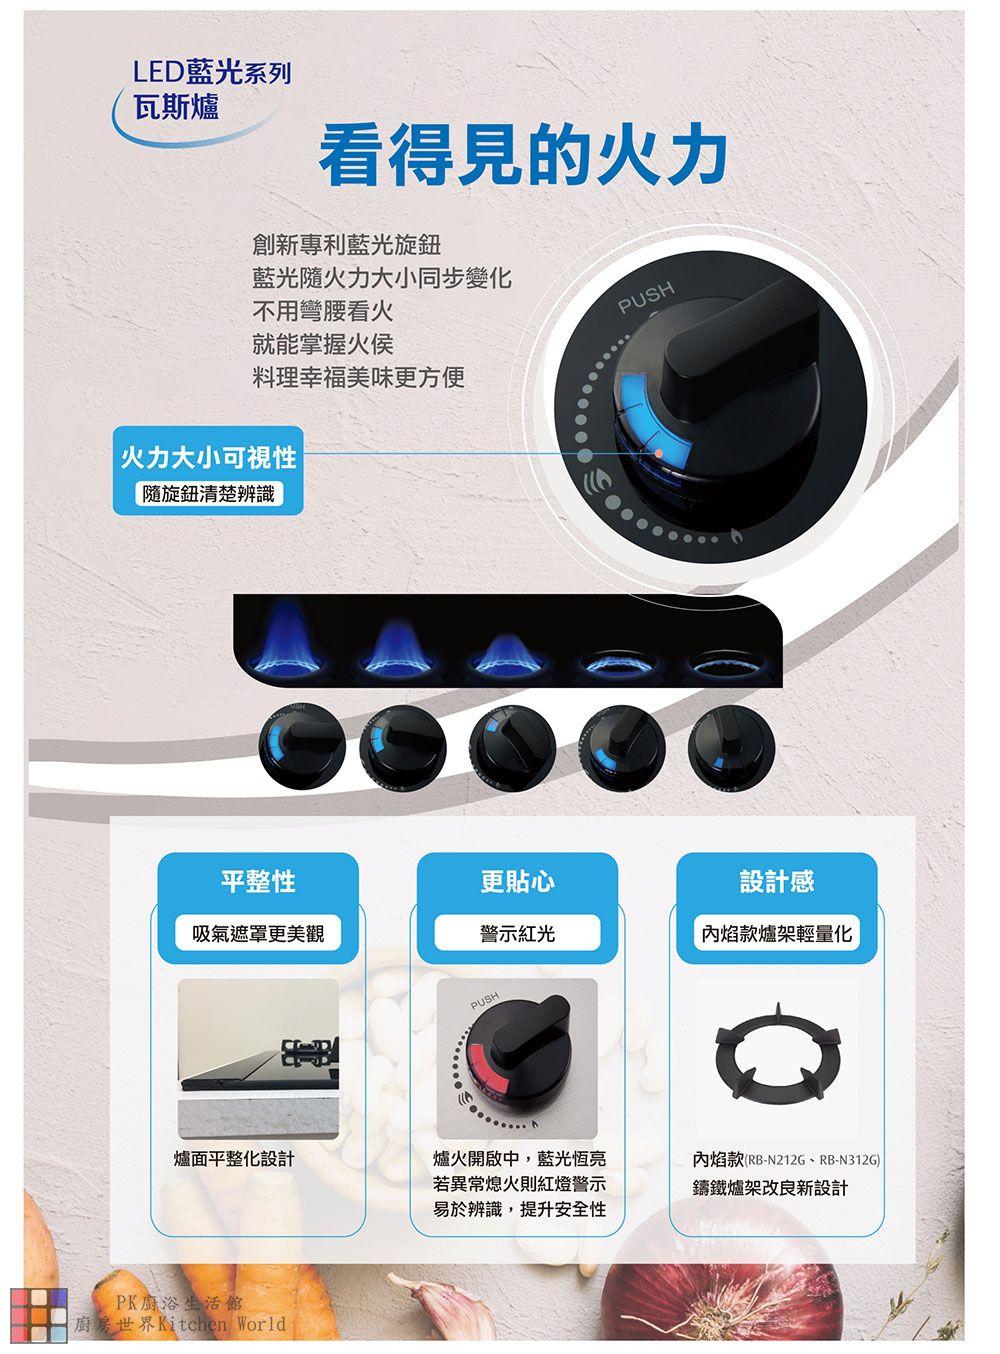 PK/goods/Rinnai/Gas stove/RB-F212G-DM-1.jpg